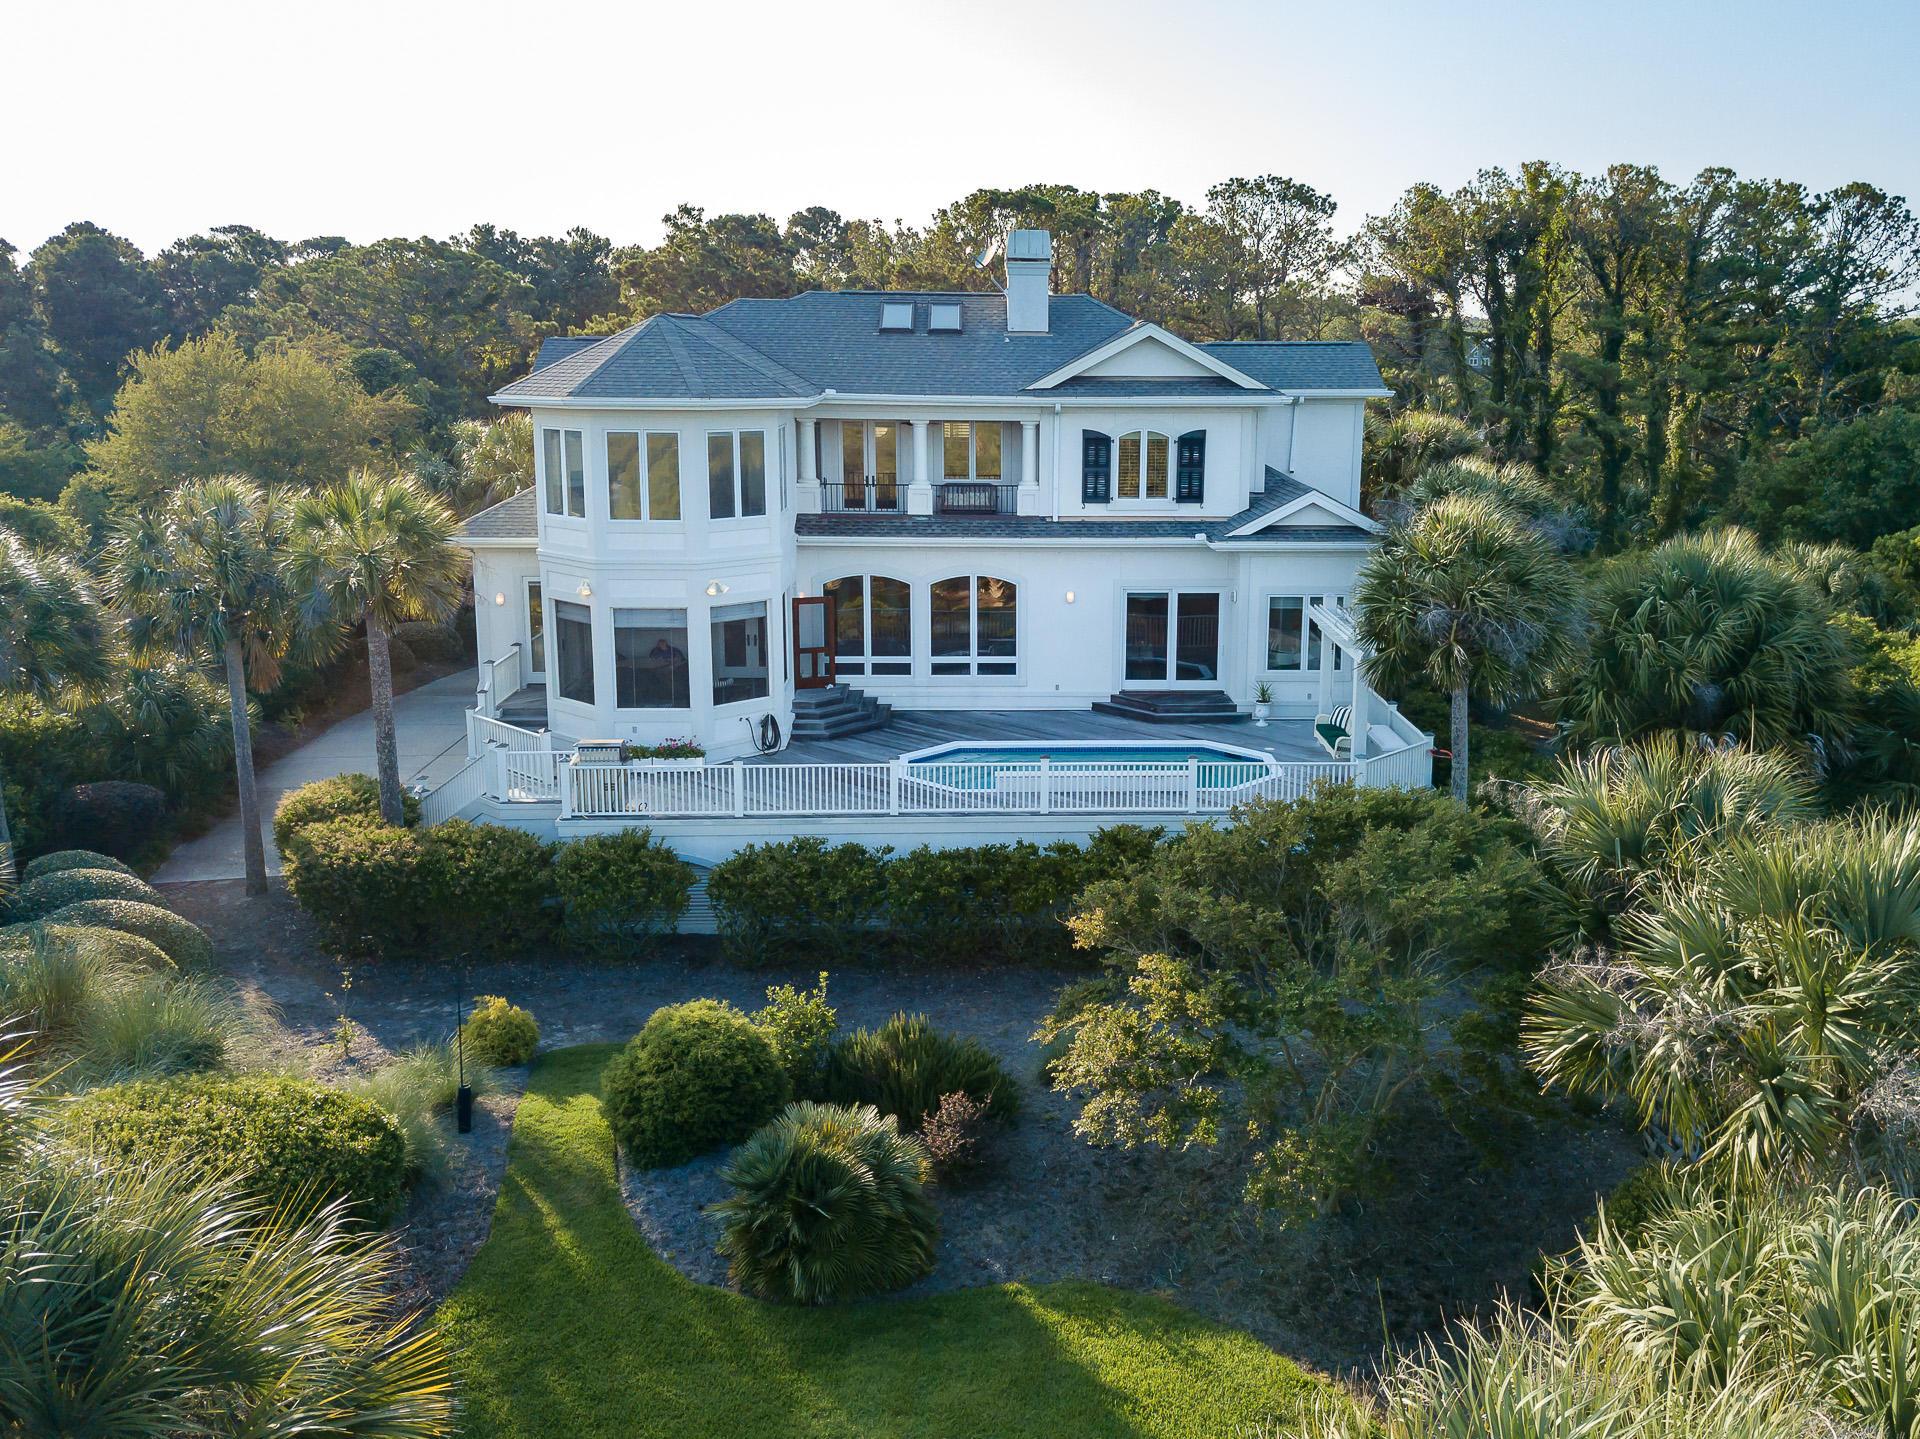 Seabrook Island Homes For Sale - 2216 Rolling Dune, Seabrook Island, SC - 33